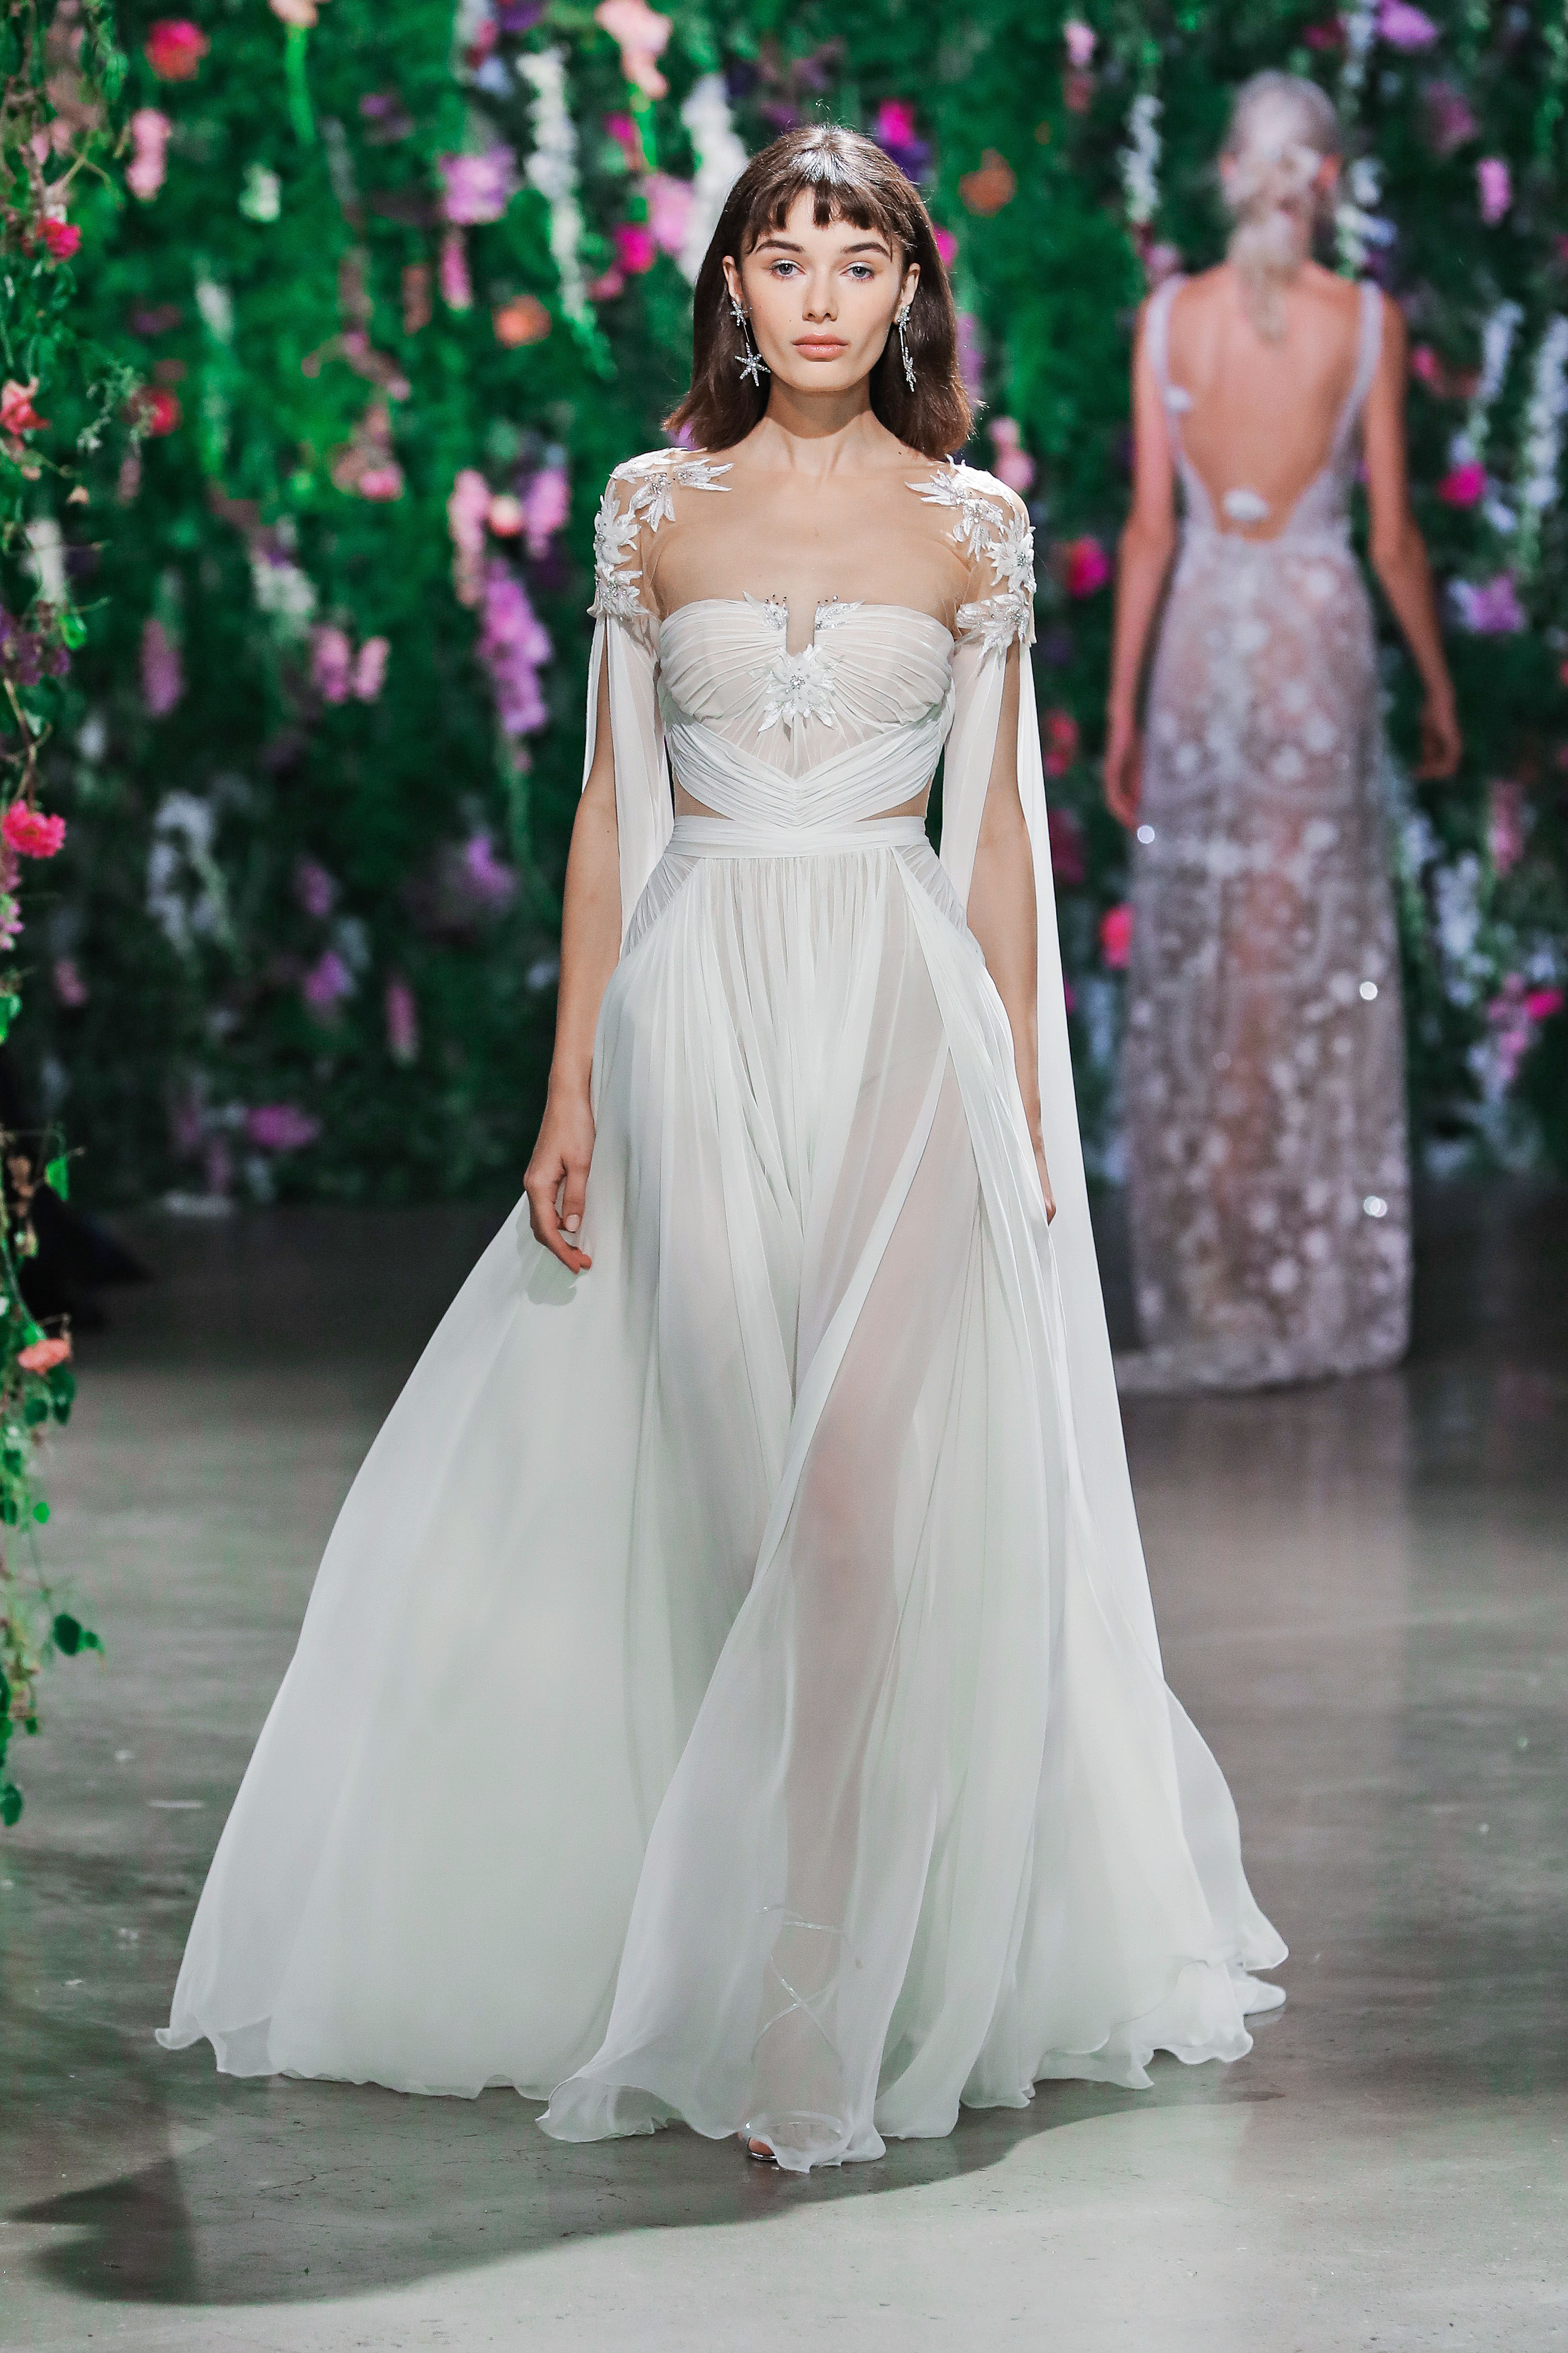 Galia Lahav Styled Sweetheart Wedding Dress Fall 2018